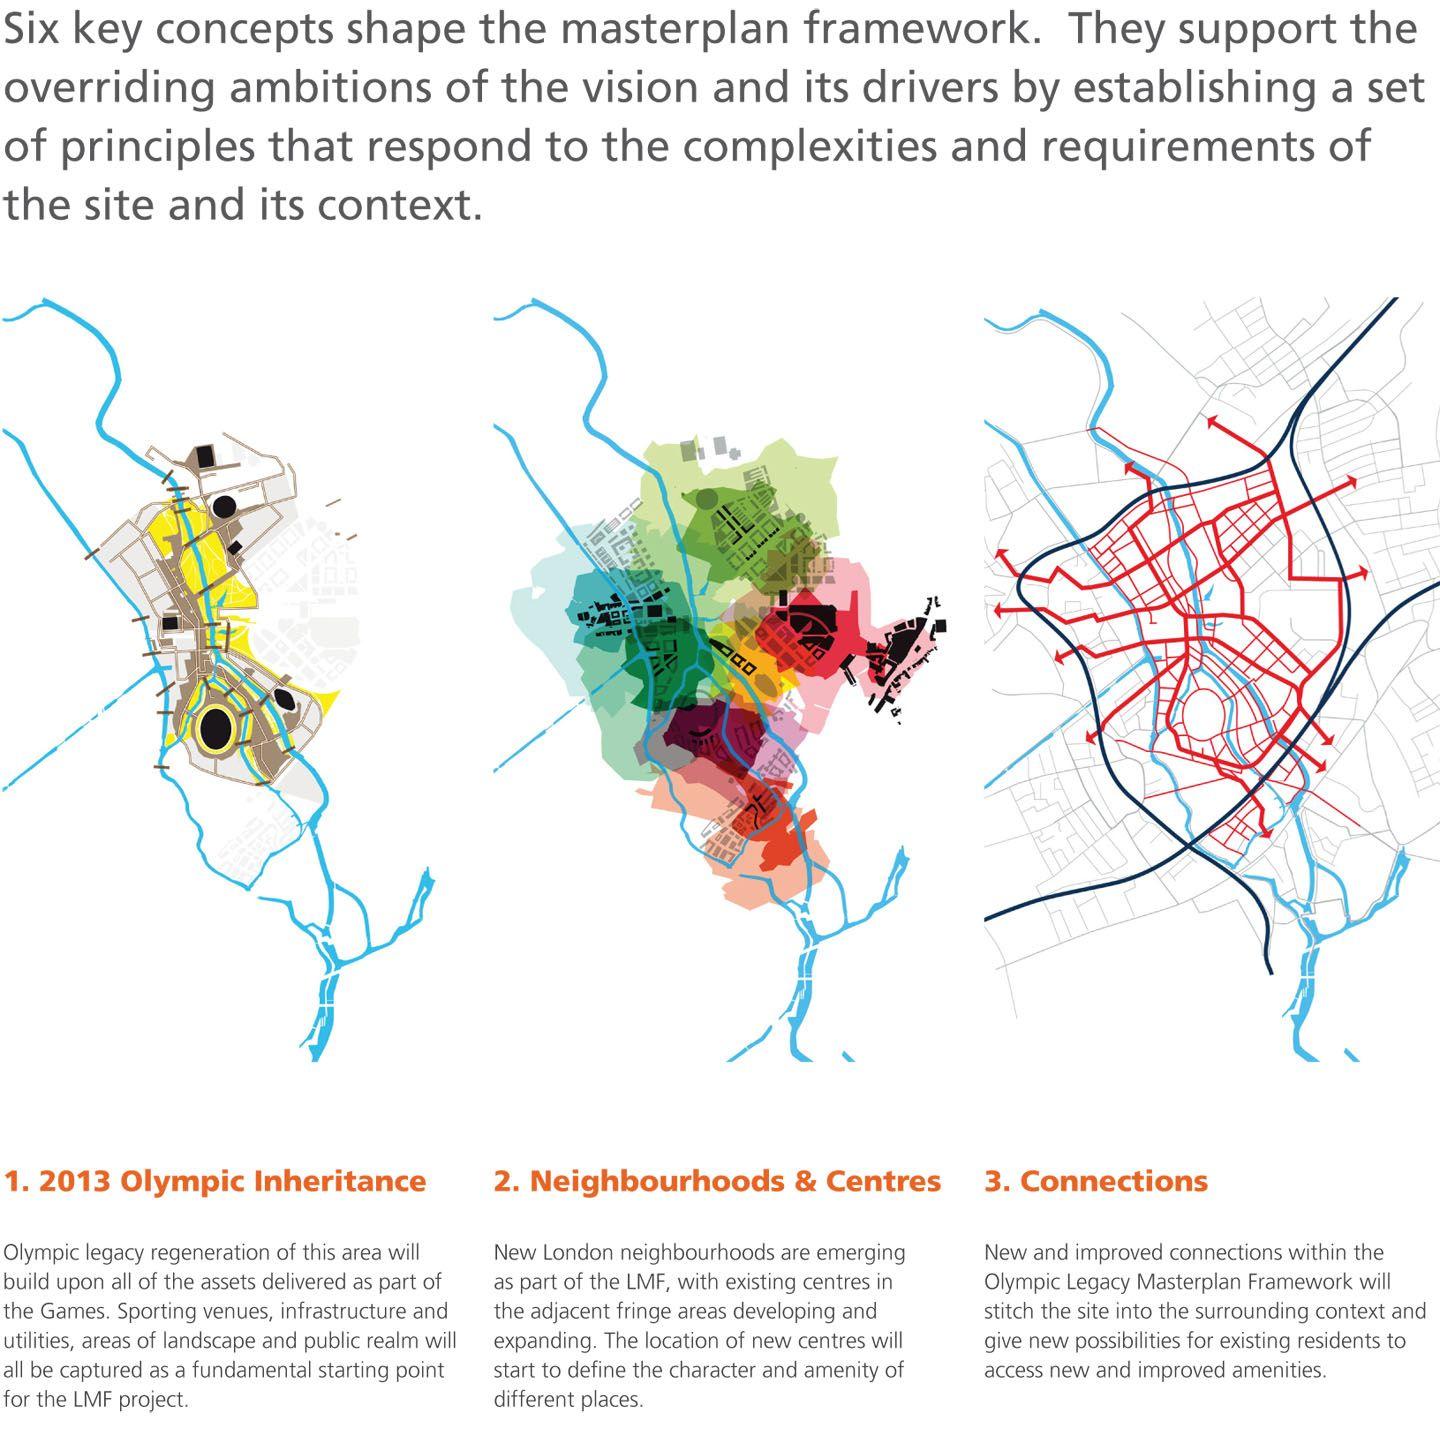 Visuals Legacy Masterplan Framework Projects Kcap Diagram Pinterest